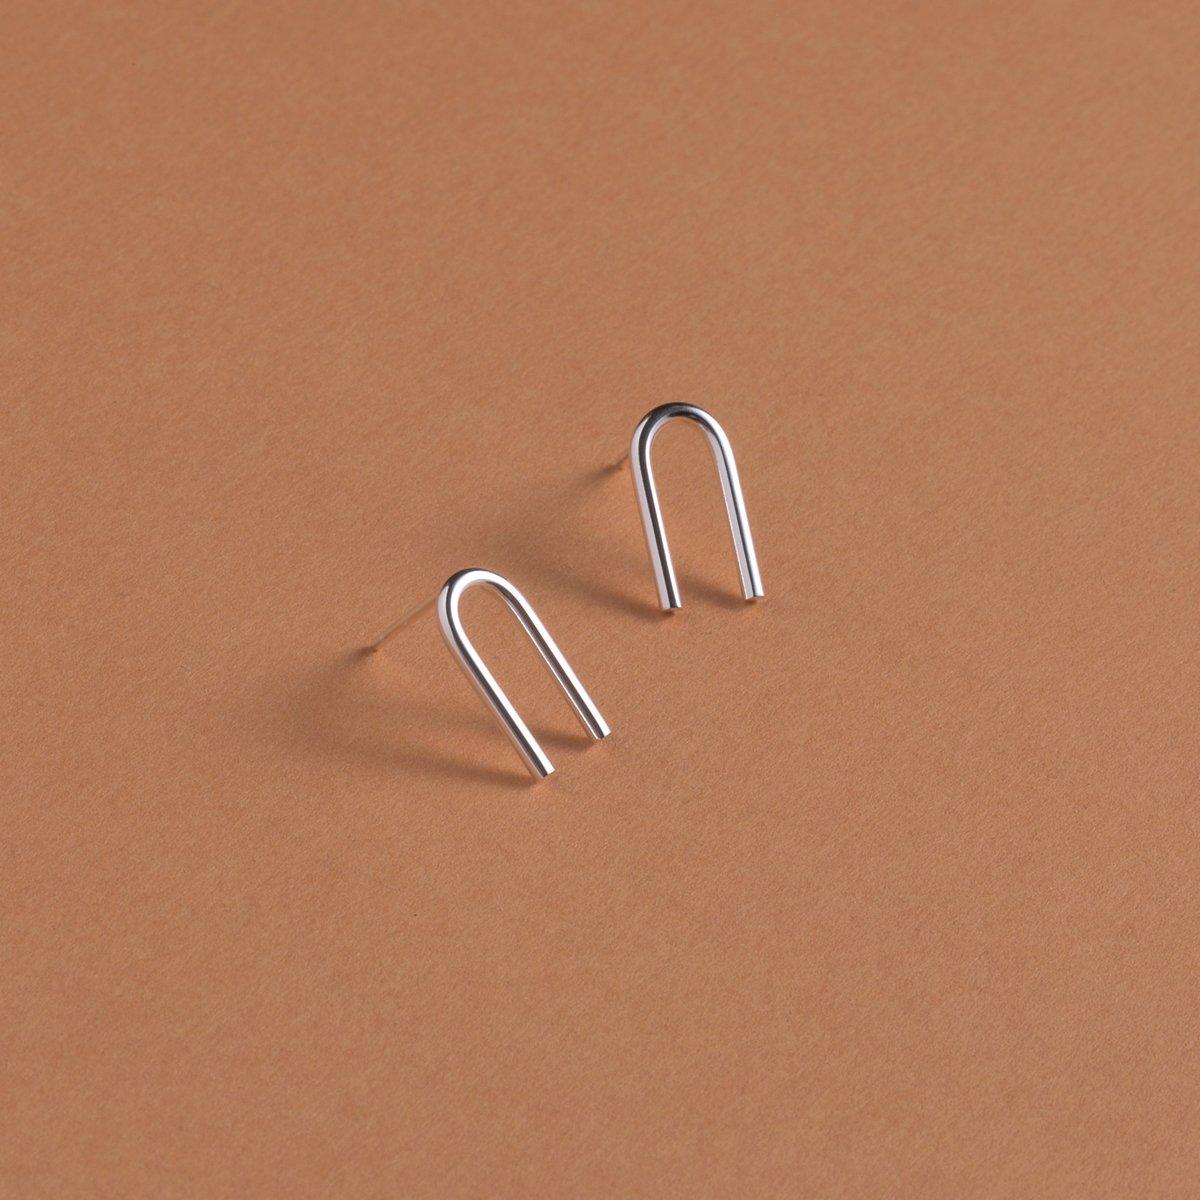 Image of UPSILON/STUD EARRINGS